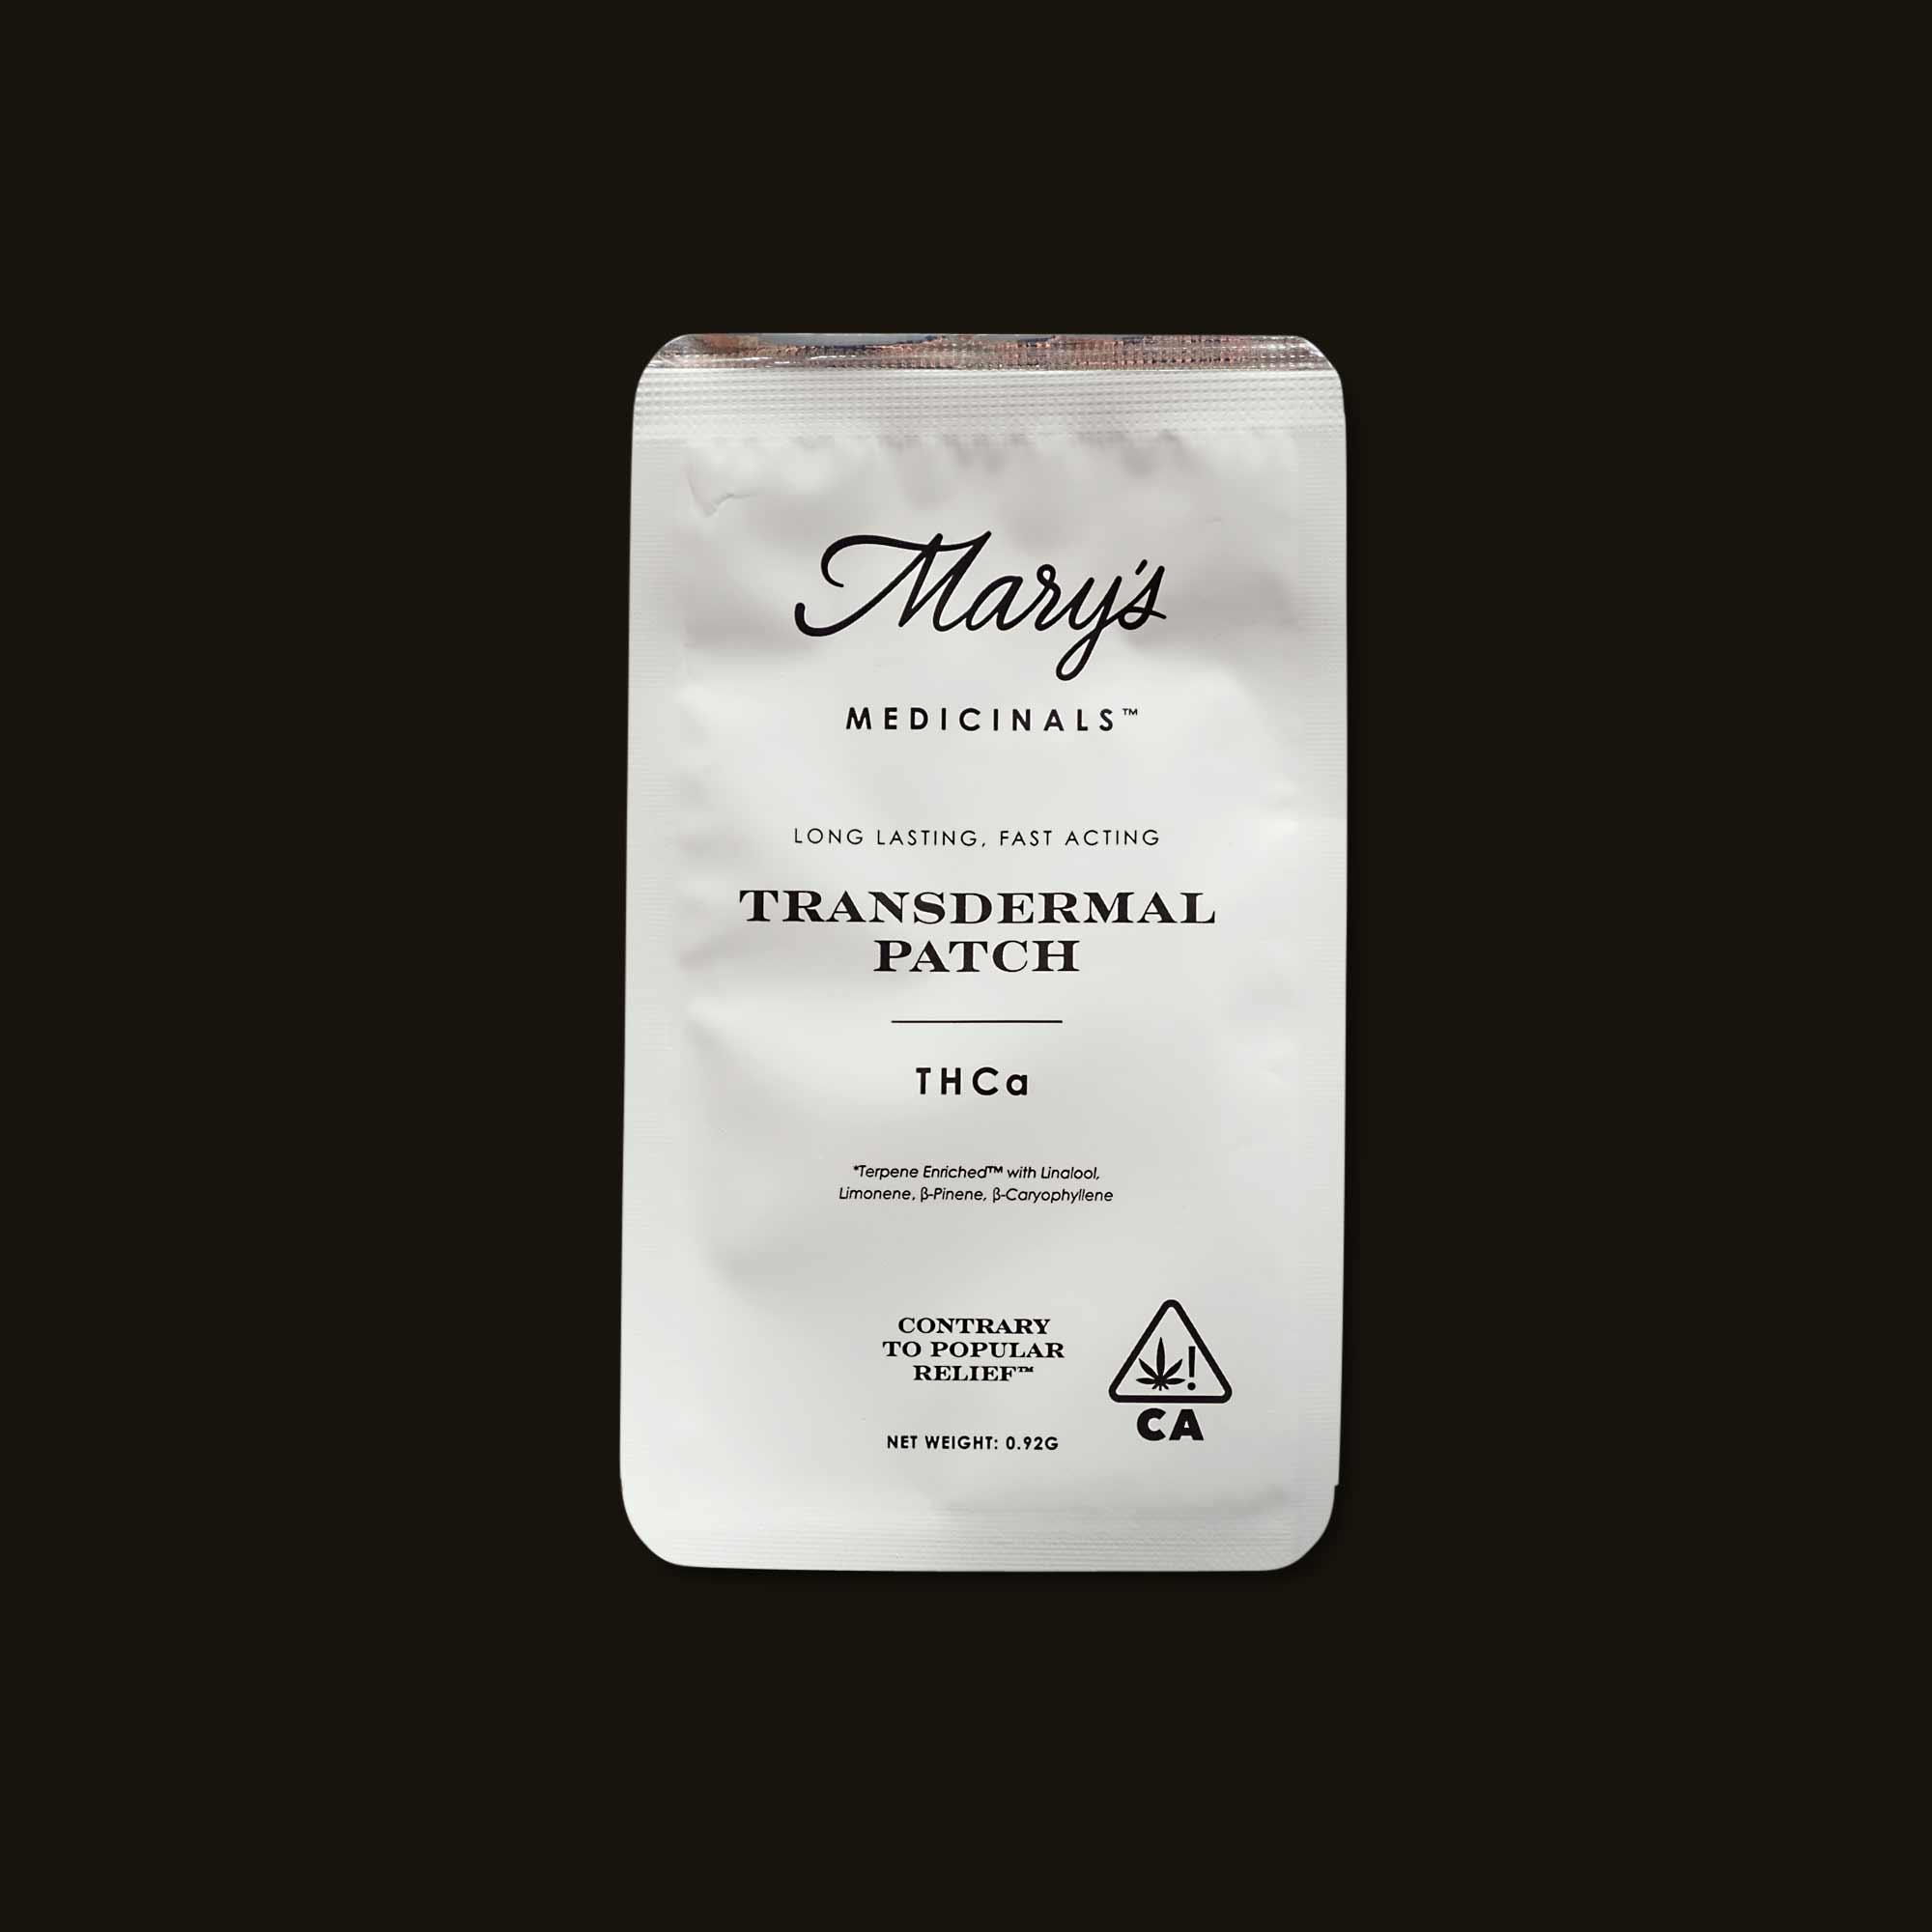 Mary's Medicinals THCa Transdermal Patch